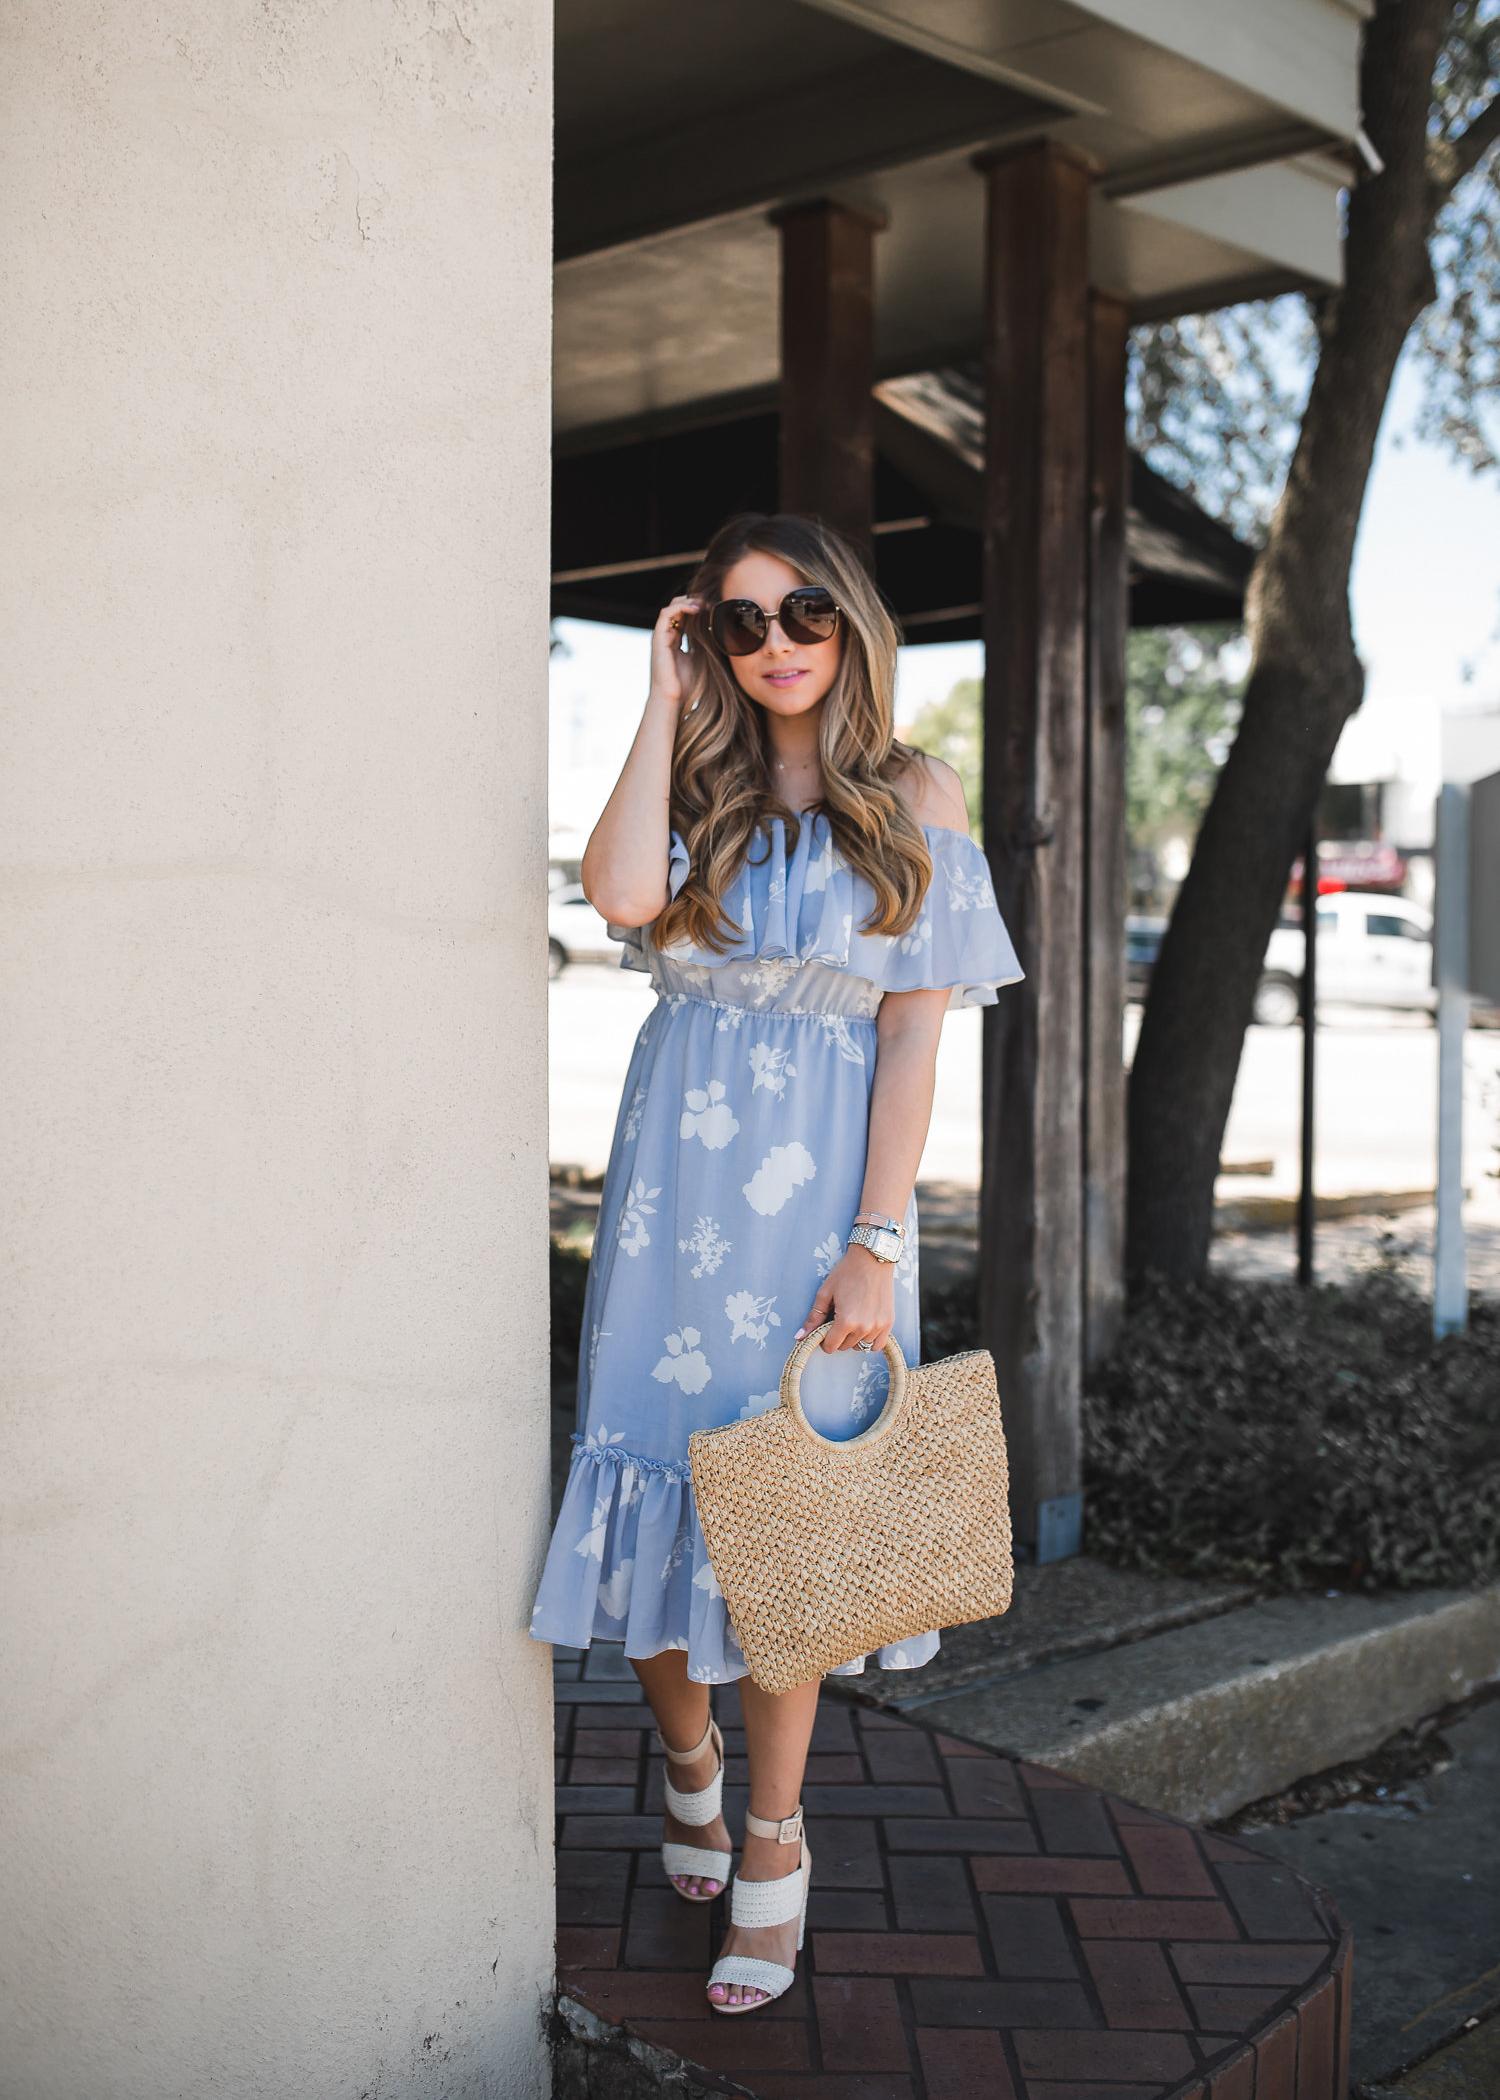 Off the Shoulder Blue Midi Dress | The Teacher Diva: a Dallas Fashion Blog featuring Beauty & Lifestyle